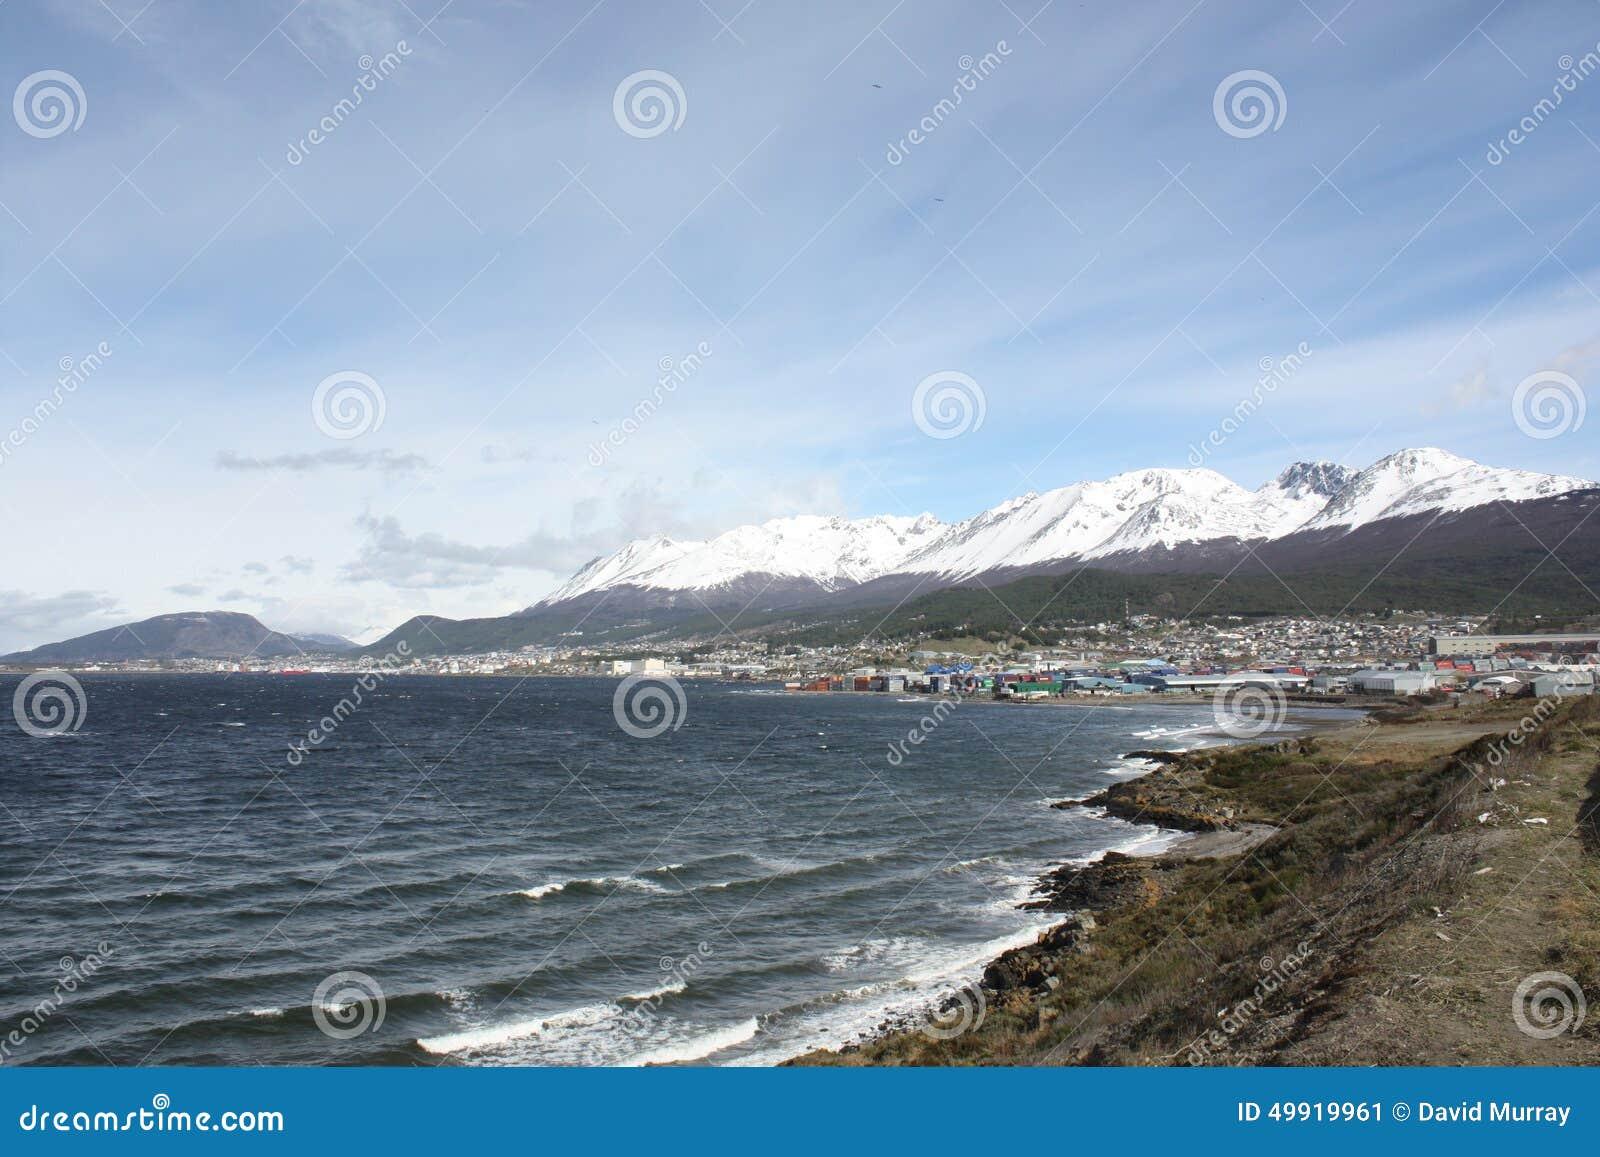 View of Ushuaia, Patagonia